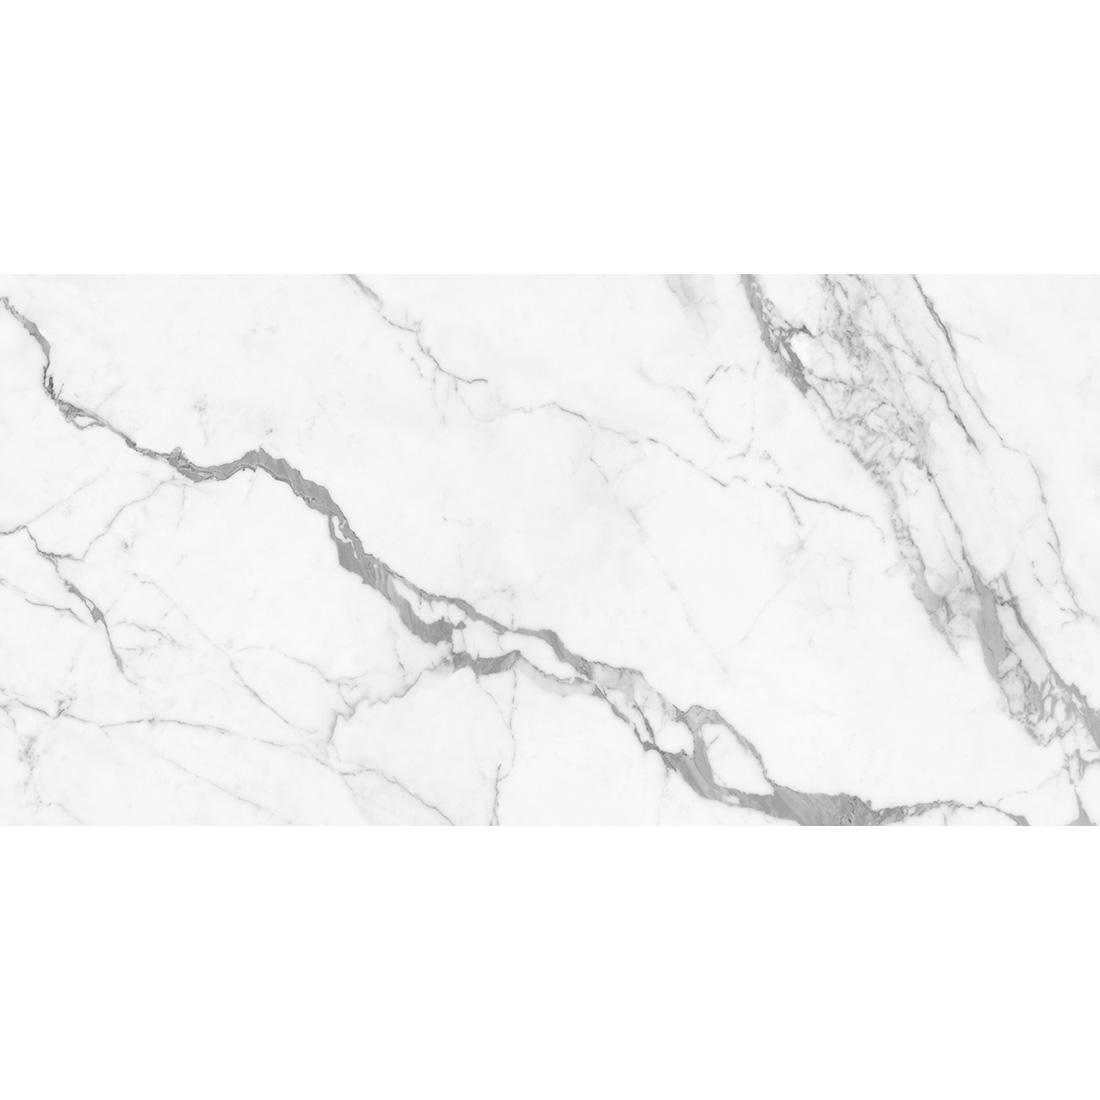 Nordico 60x120 White Polished